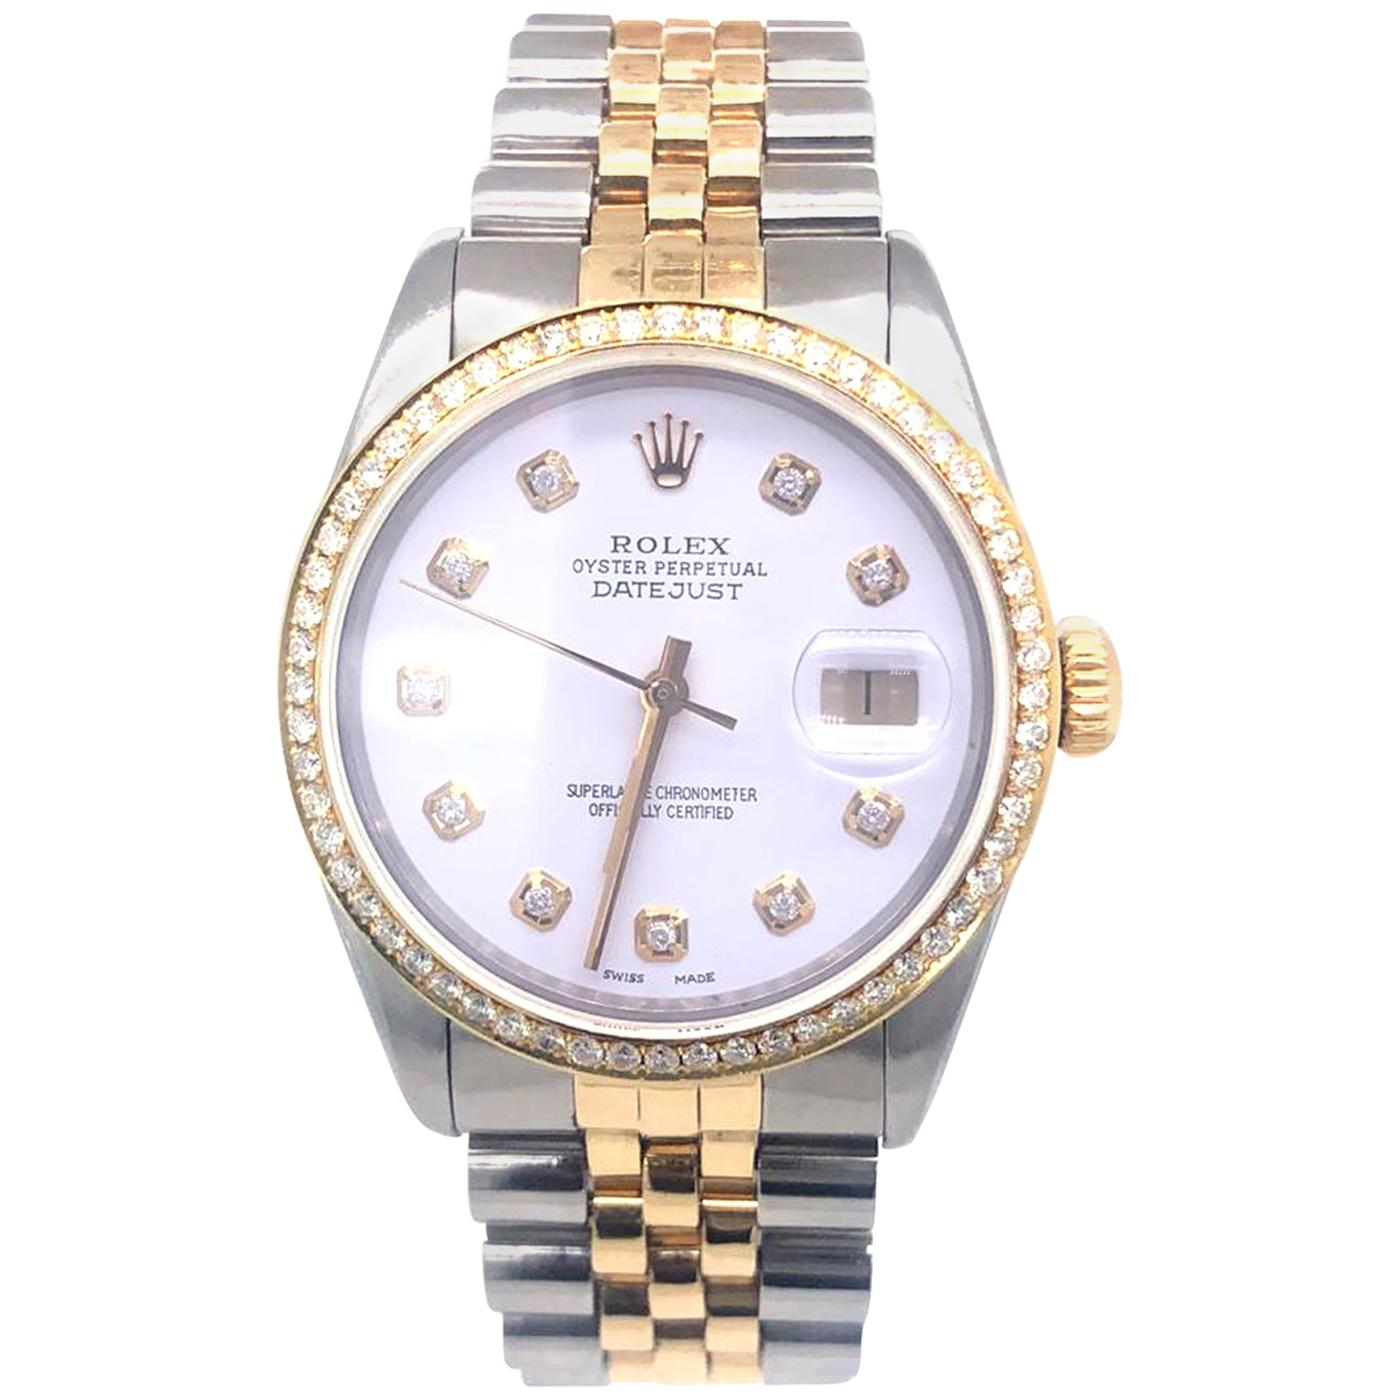 Rolex Datejust Two-Tone Diamond Bezel Diamond Dial Stainless Steel 16030